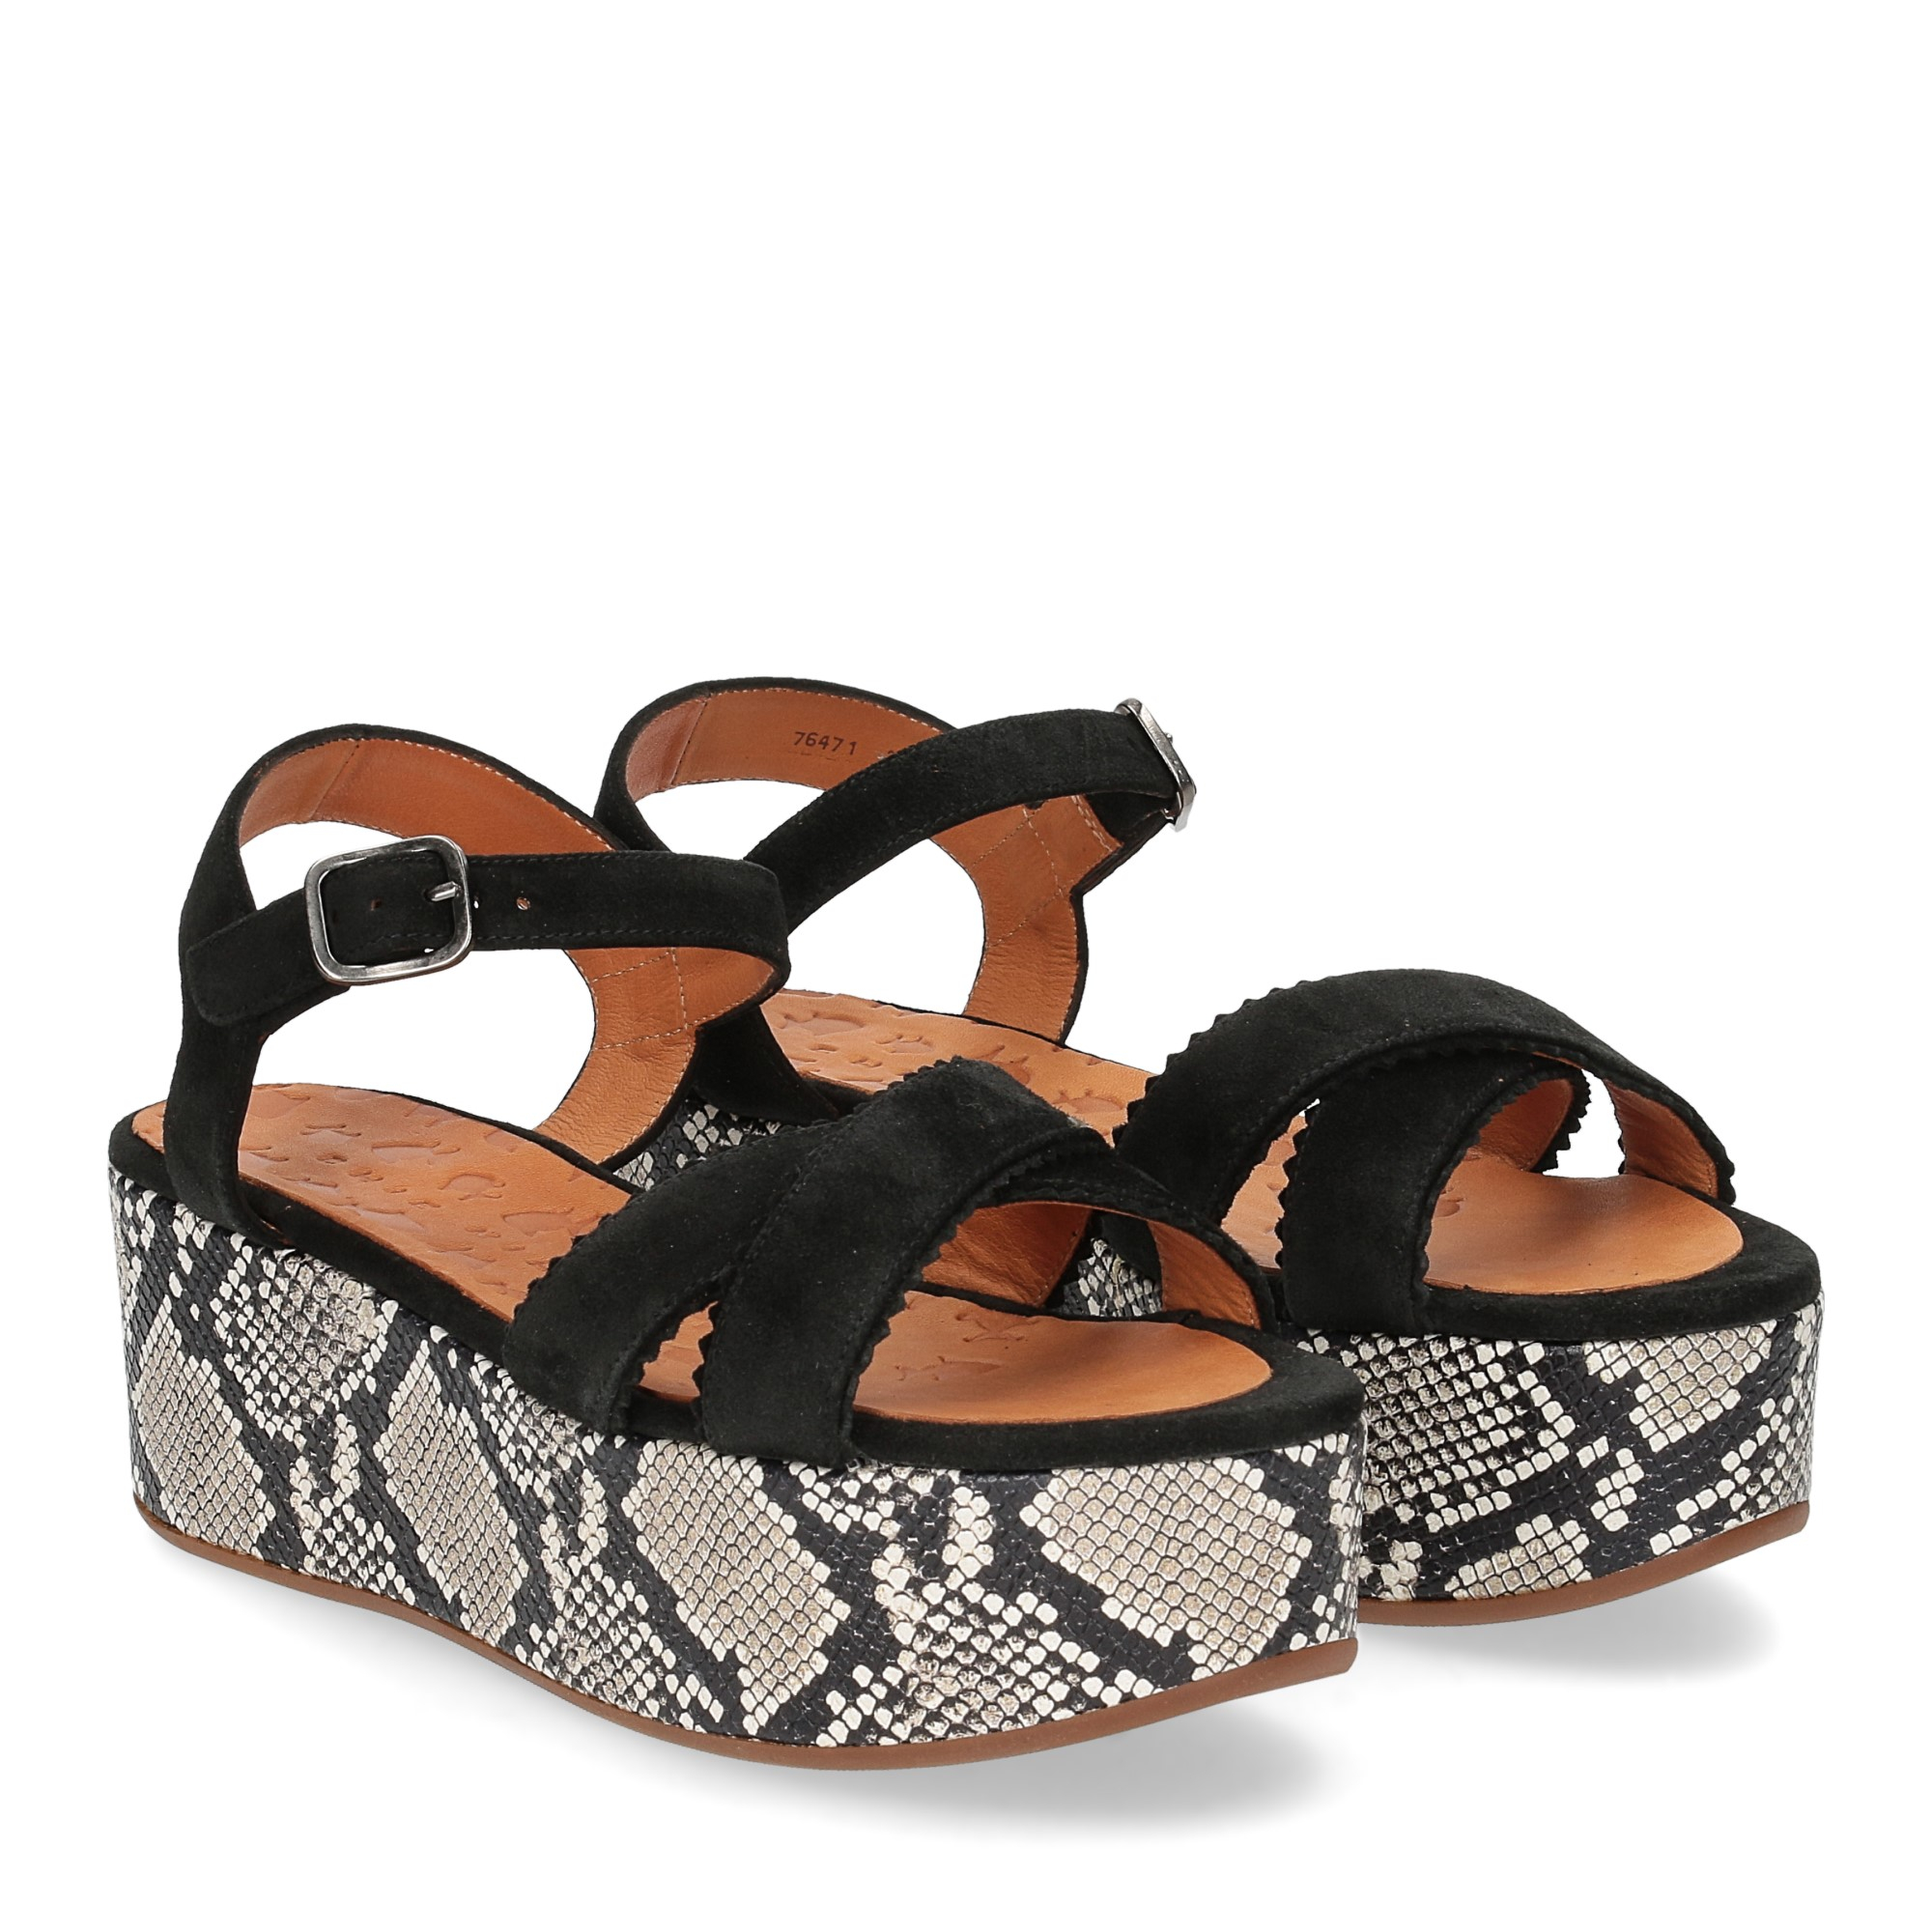 Chie Mihara sandalo Olinda camoscio nero